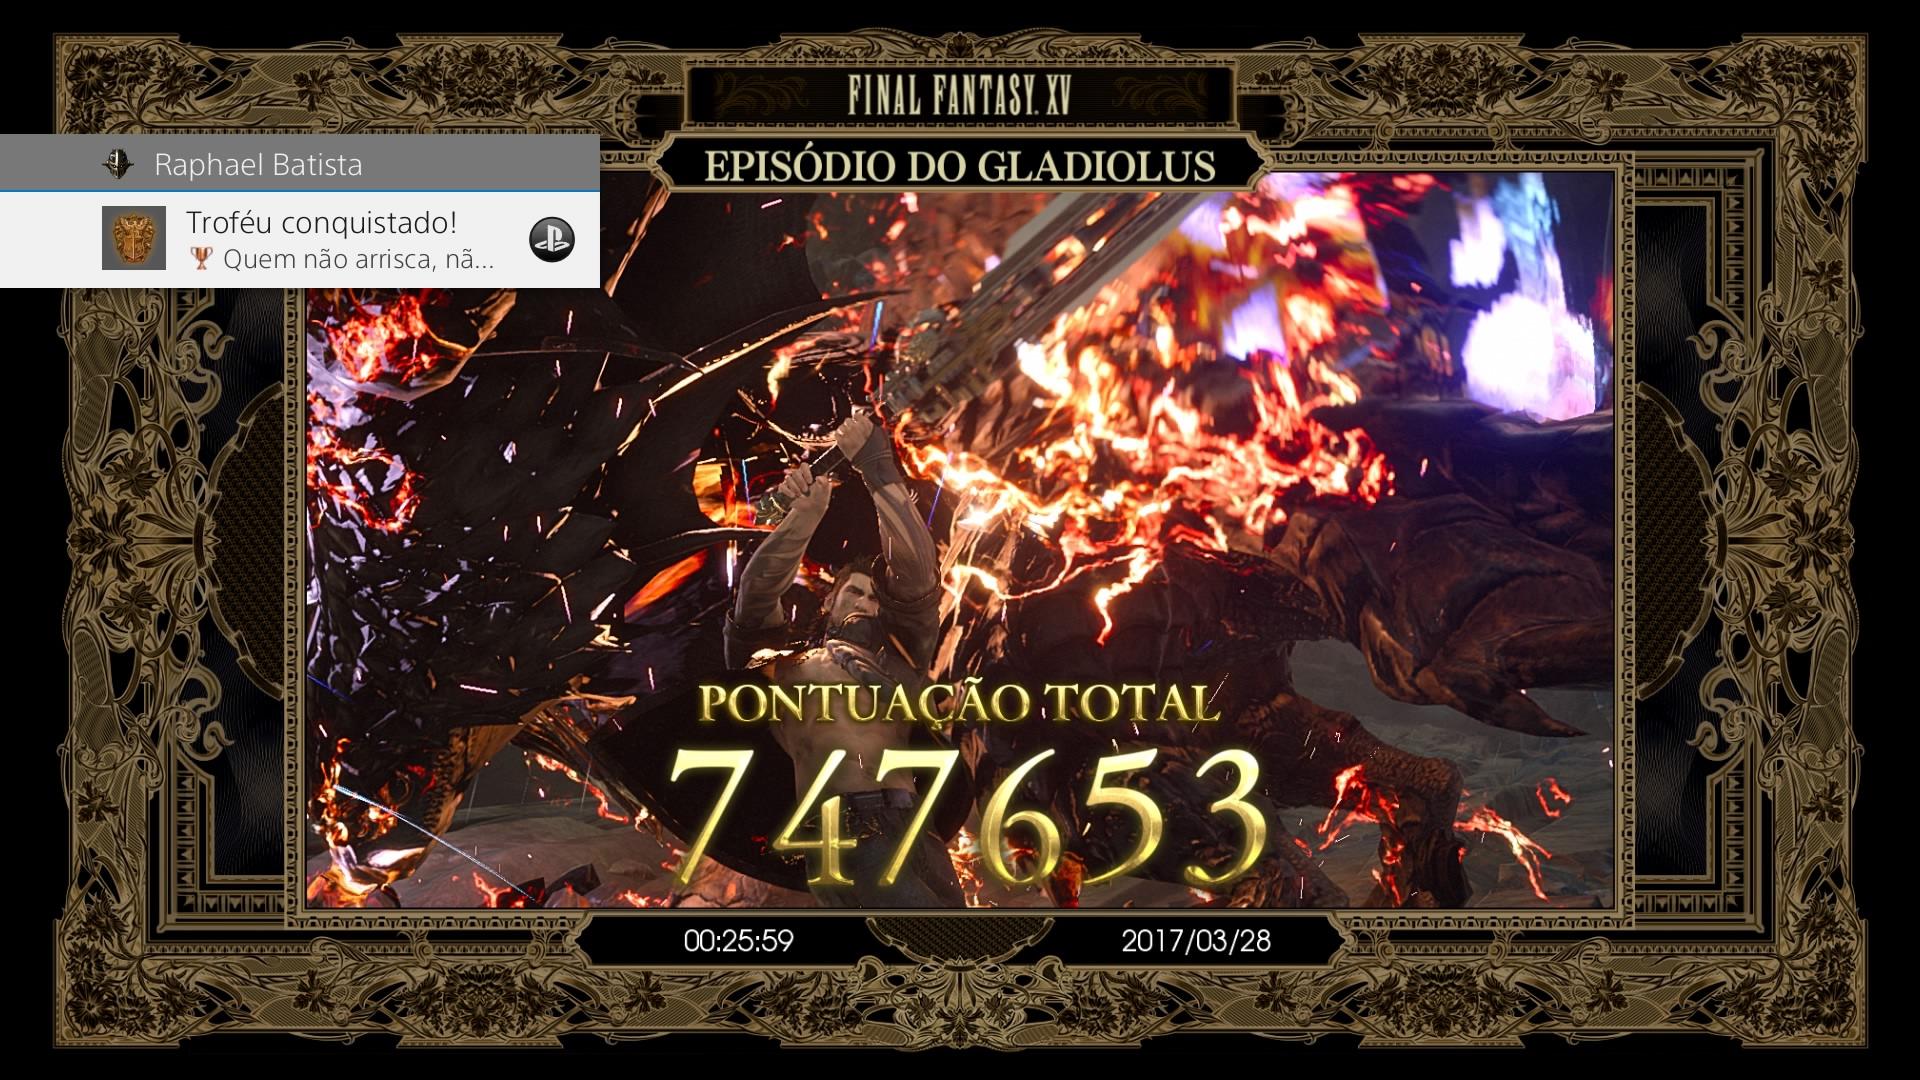 Final Fantasy XV: Episódio Gladiolus: Vale a pena? 4